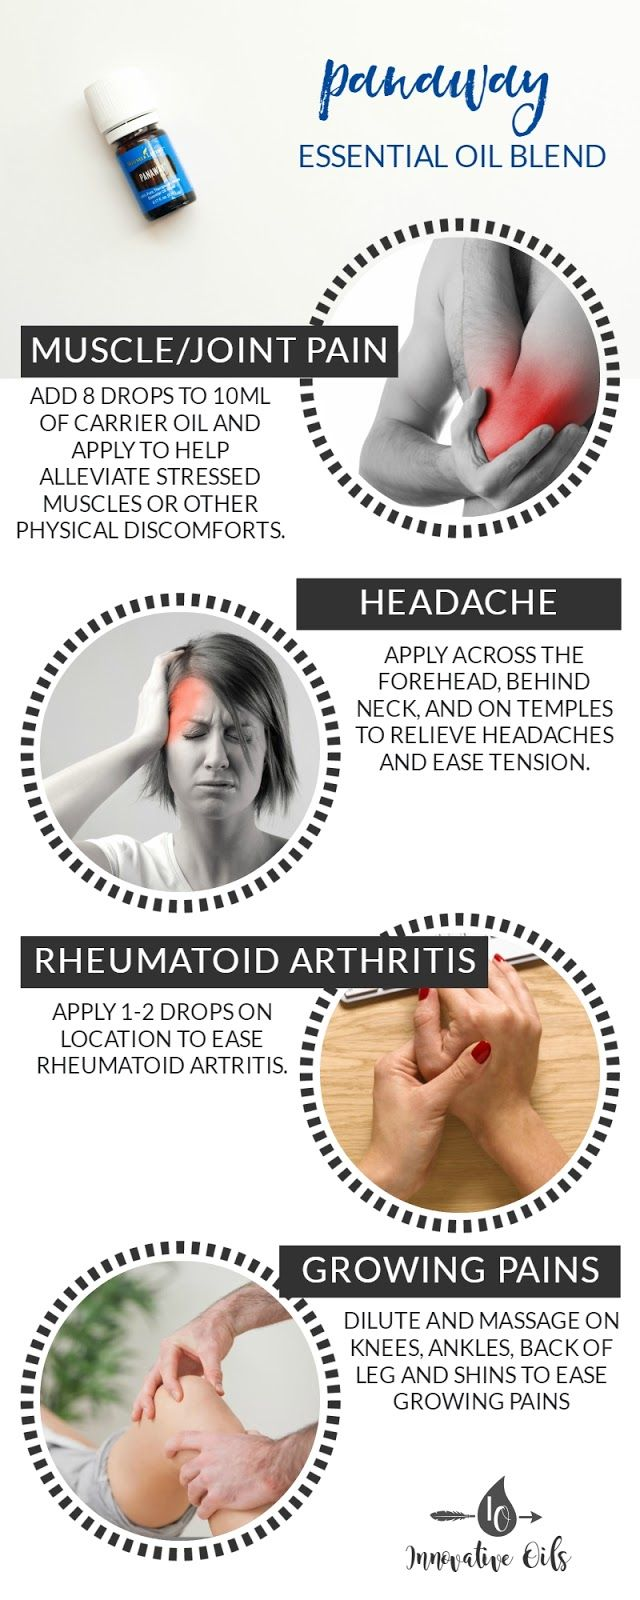 BENEFITS AND USES FOR PANAWAY ESSENTIAL OIL BLEND #musclepain #jointpain #headache #rheumatoidarthritis #growingpains #panaway #yleo #essentialoils